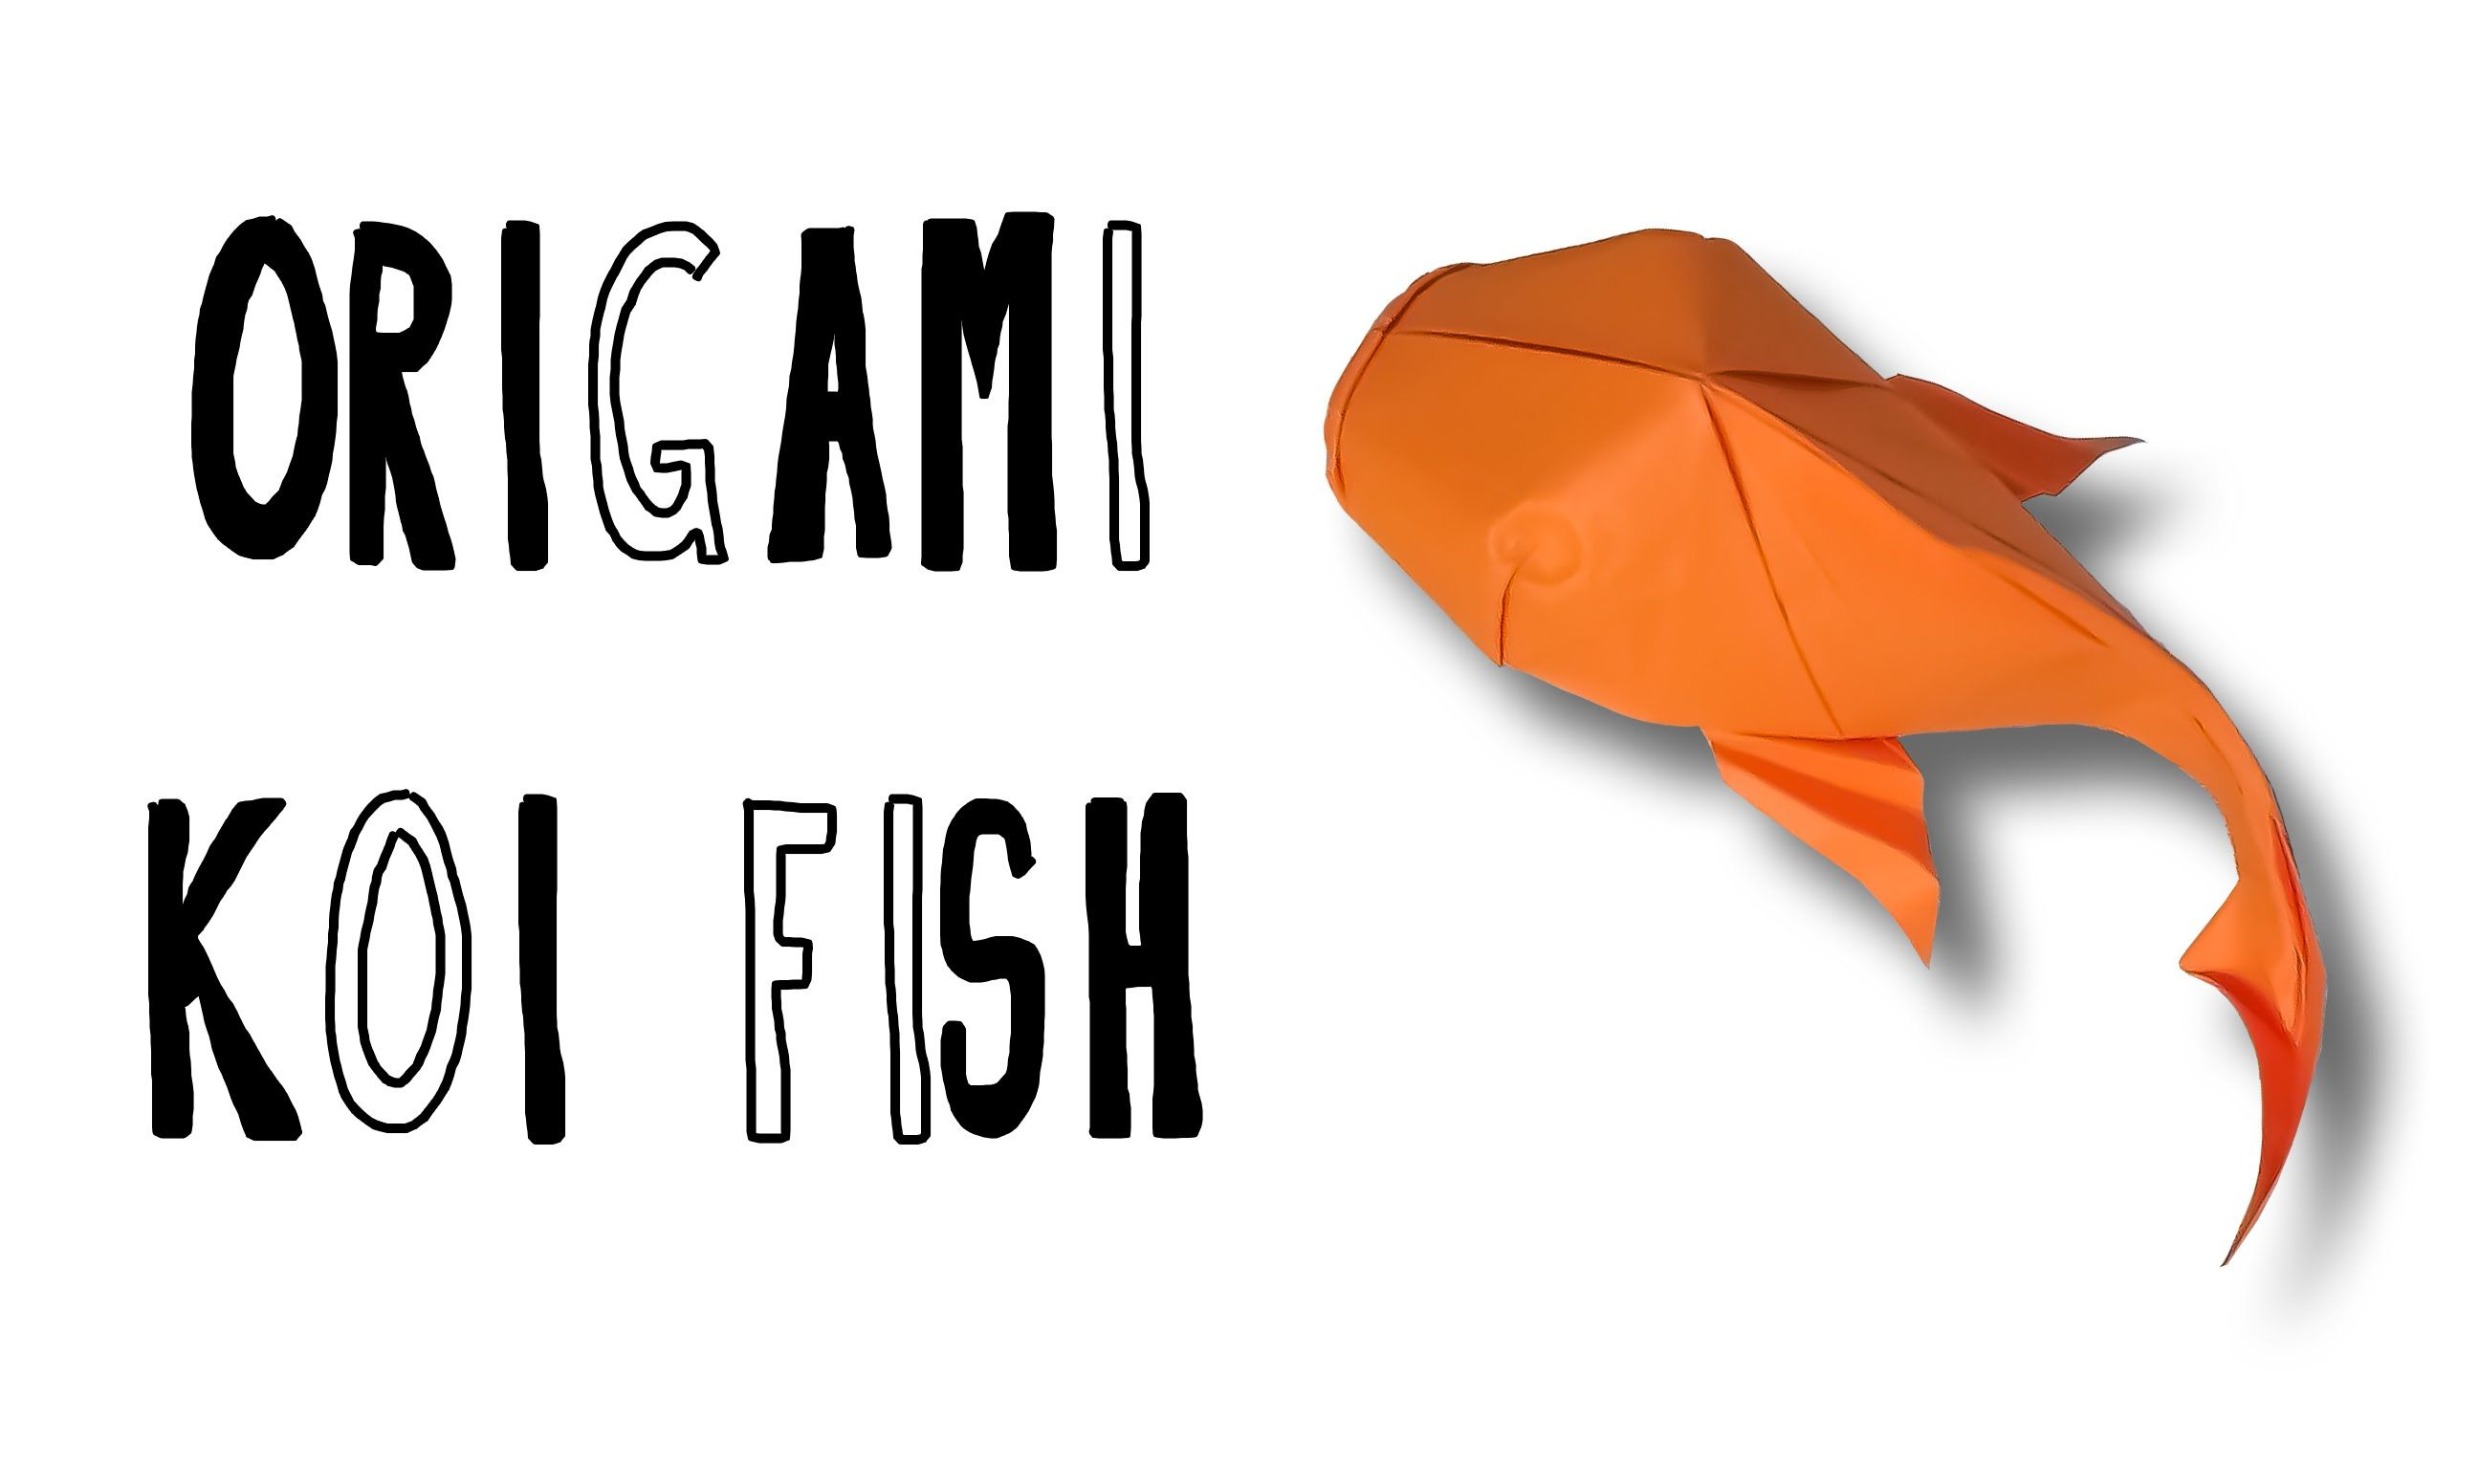 Koi Fish Ponds   Origami fish, Handmade paper crafts, Origami koi fish   1552x2592